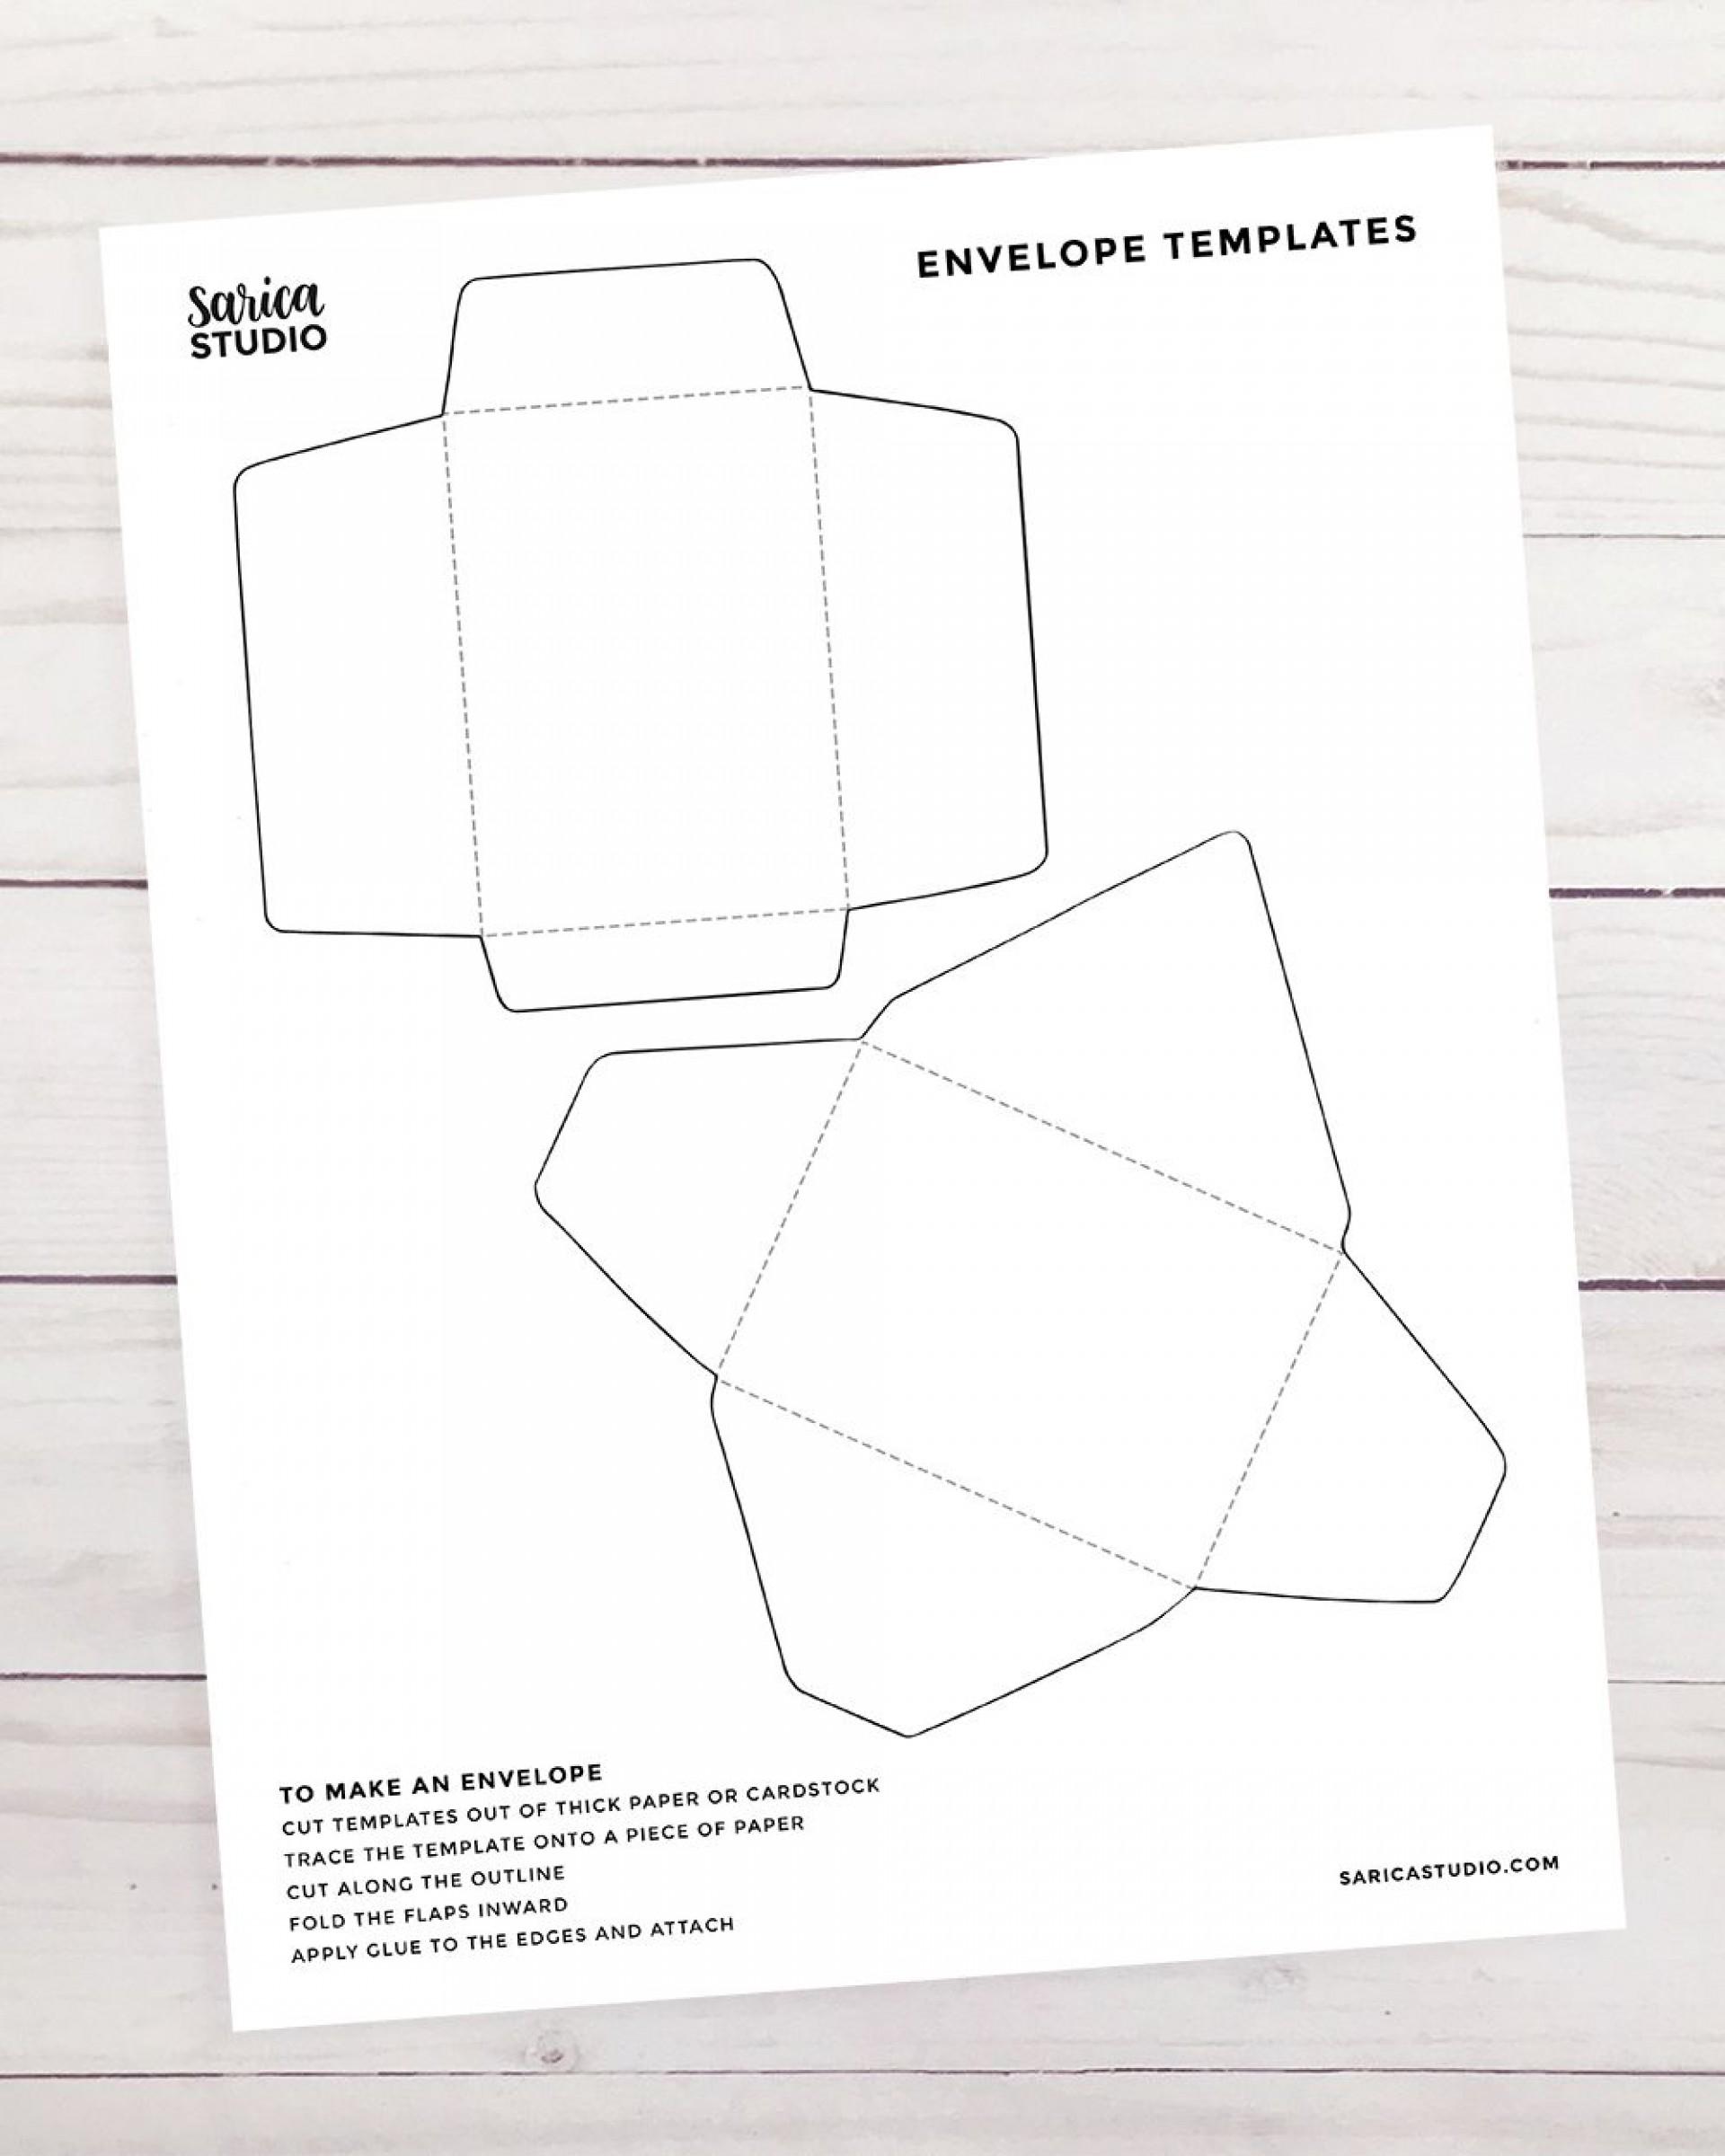 012 Frightening Gift Card Envelope Template Idea  Templates Voucher Diy Free Printable1920